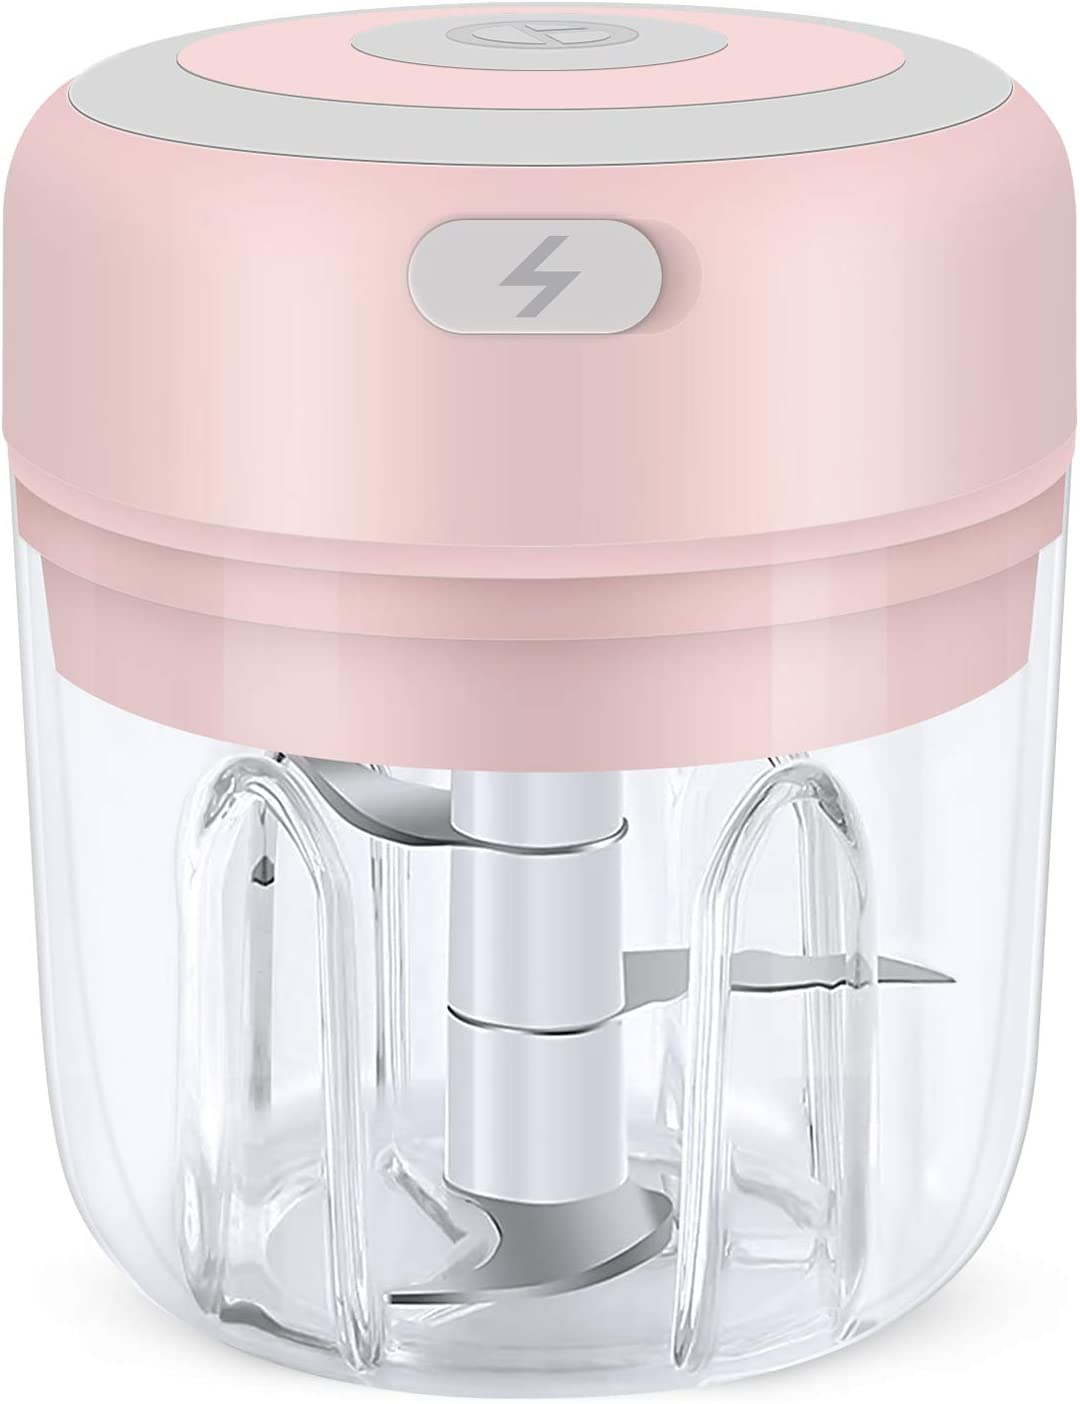 Hawiton Mini Electric Chopper 250ML, Portable Food Chopper & Grinder for Kitchen- Garlic Press Chopper/Food Grinder/Masher/Blender for Garlic, Onion, Vegetables, Meat, Mincing& Puree Food Processor